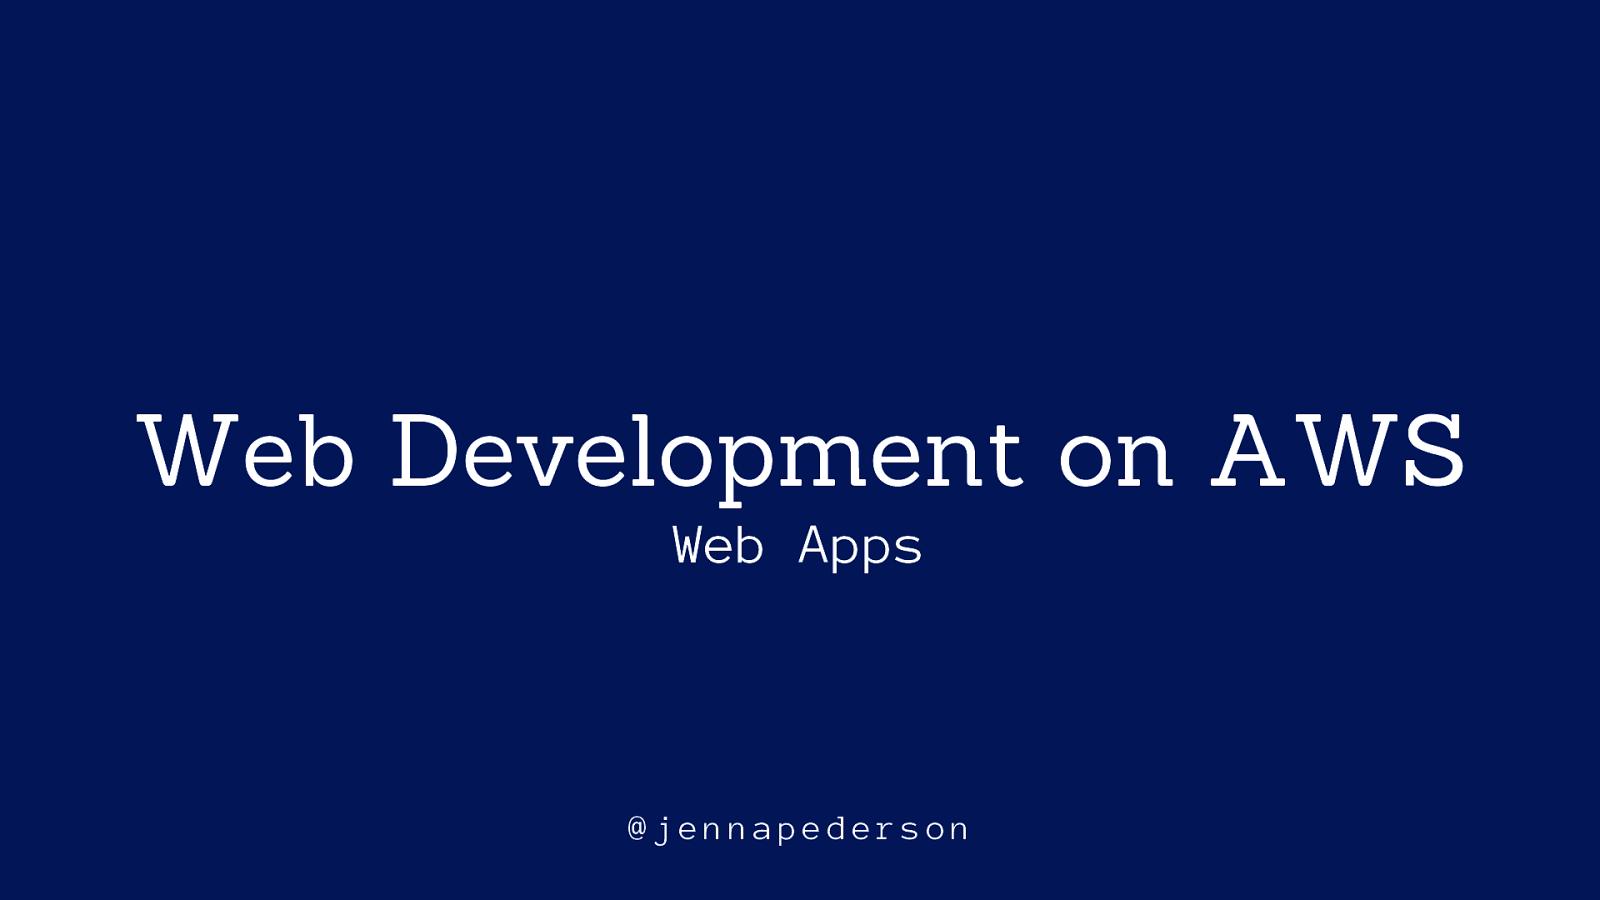 Web Development on AWS - Web Apps